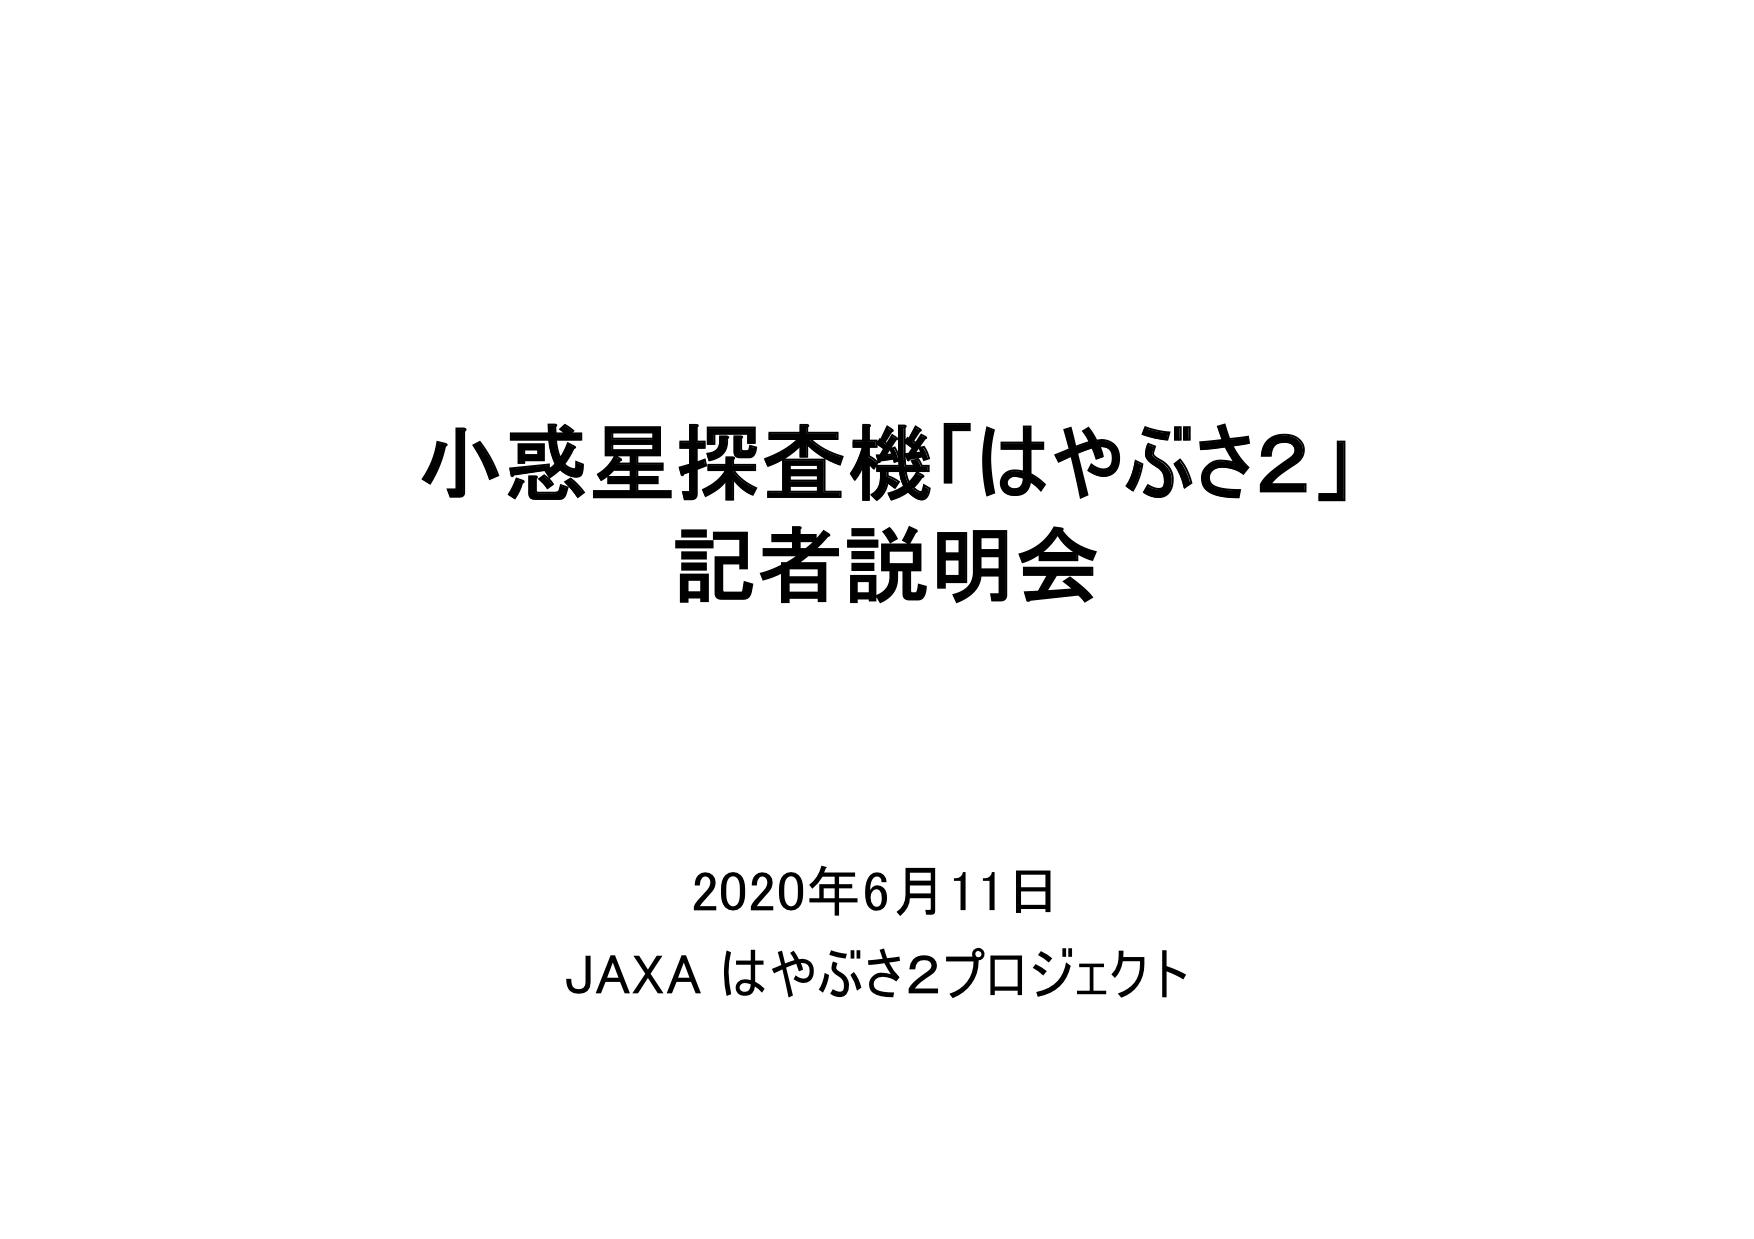 f:id:Imamura:20200611094439p:plain